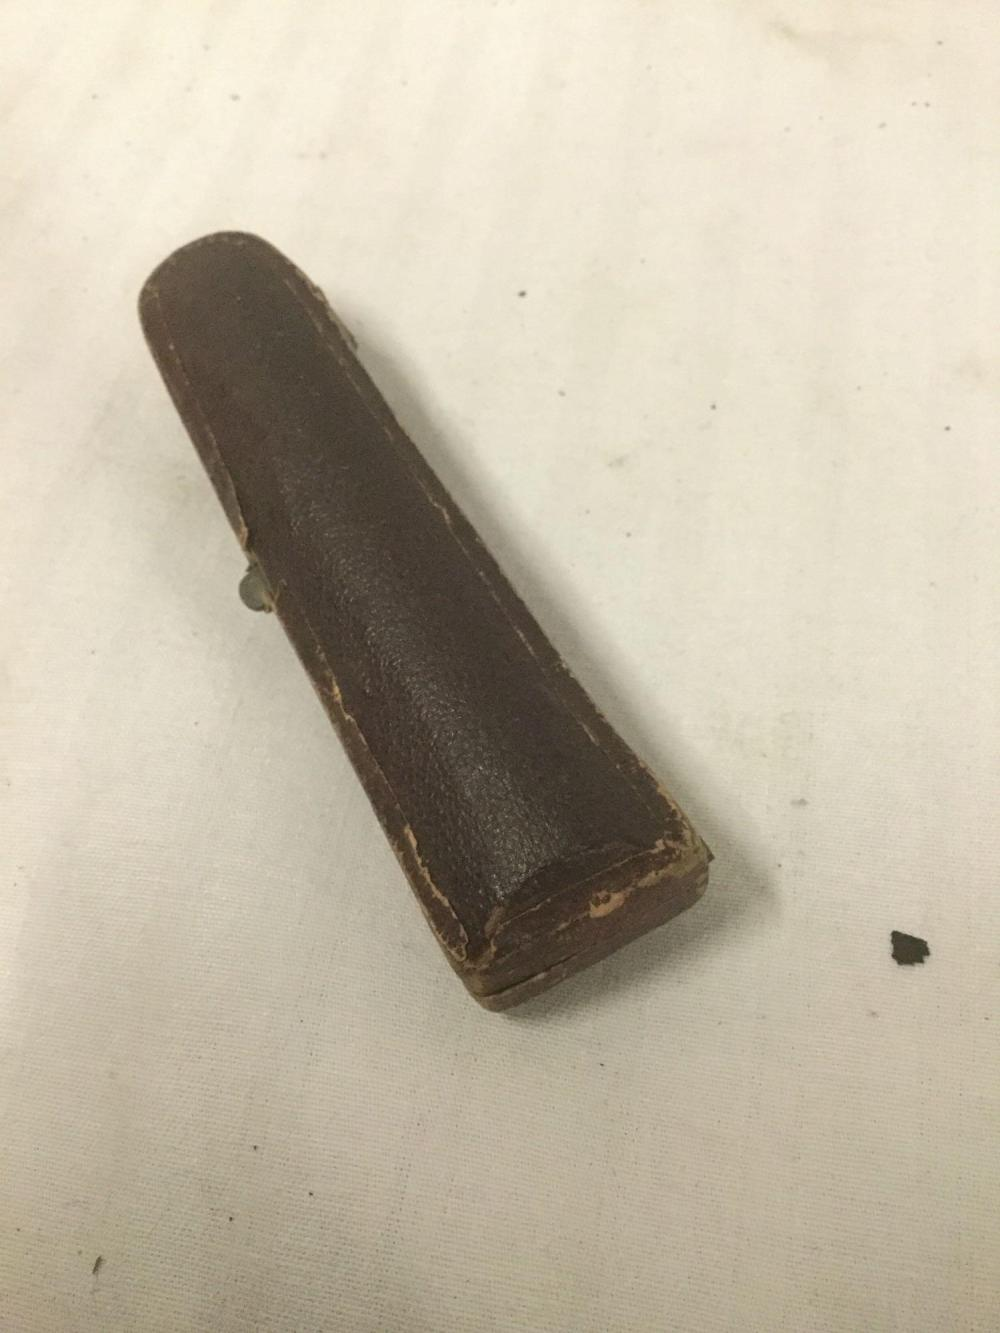 Lot 90: Vintage Genuine Meerschaum and amber cigarette holder